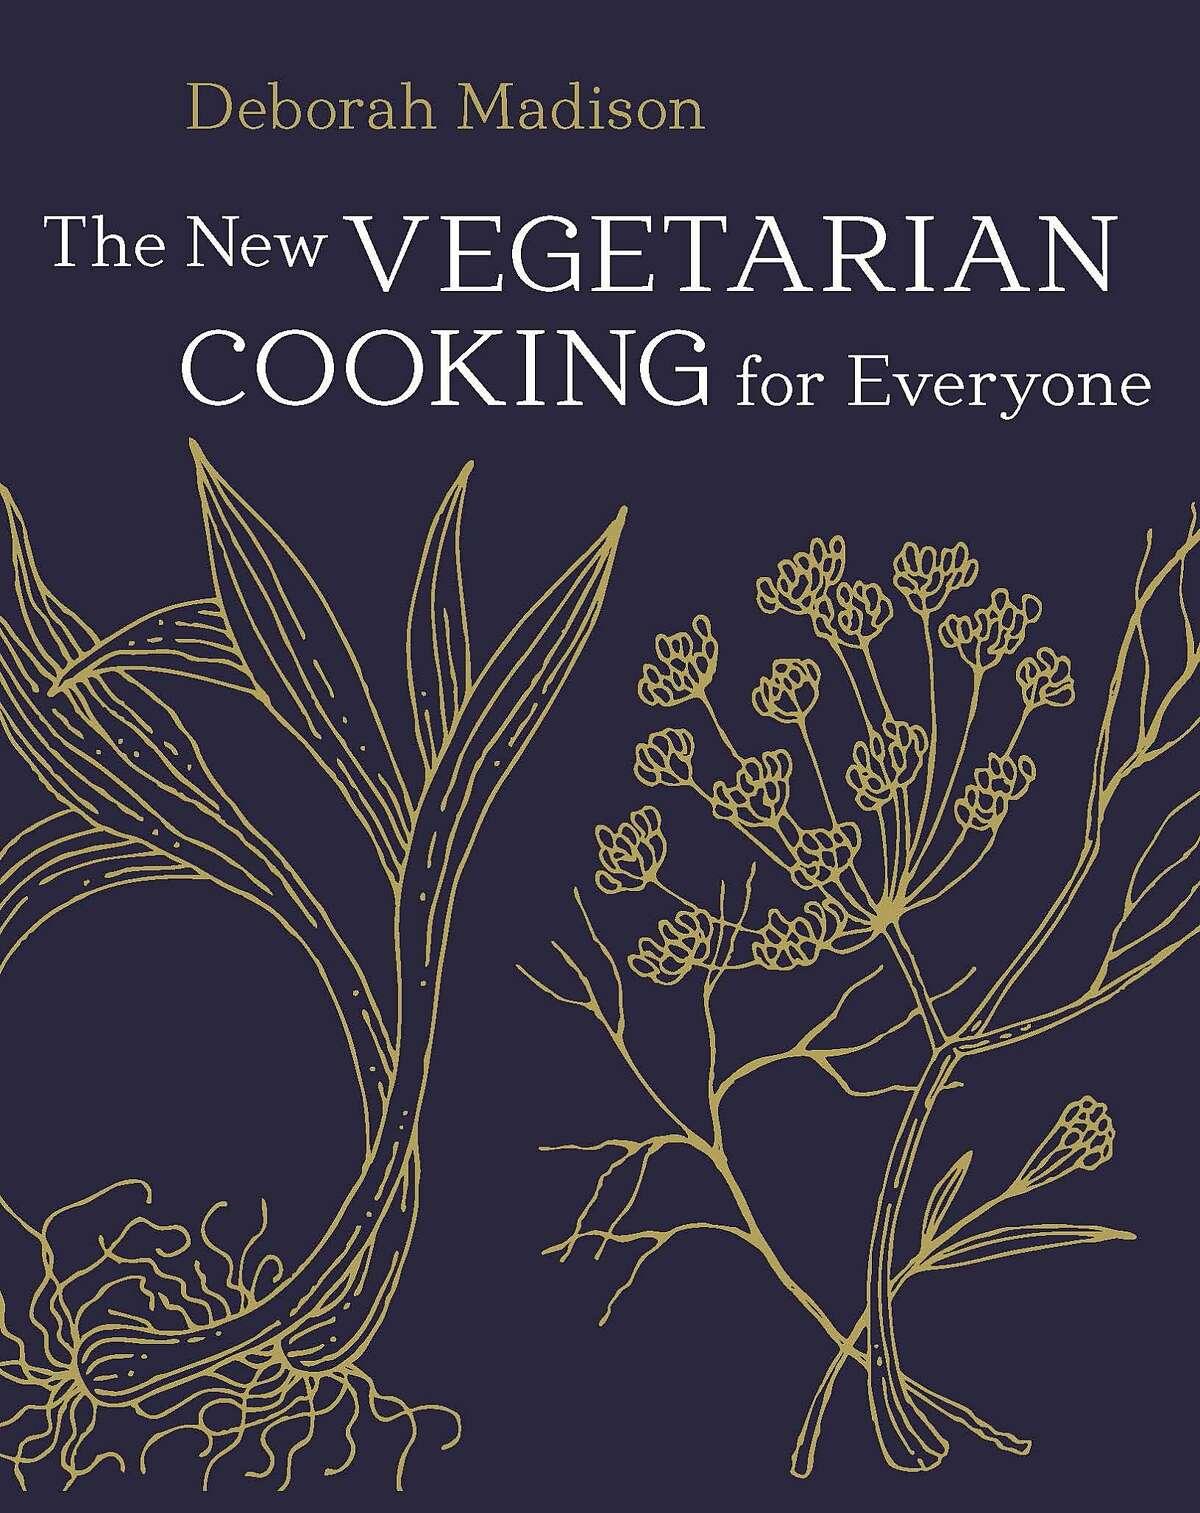 """Vegetarian Cooking for Everyone"" by Deborah Madison"